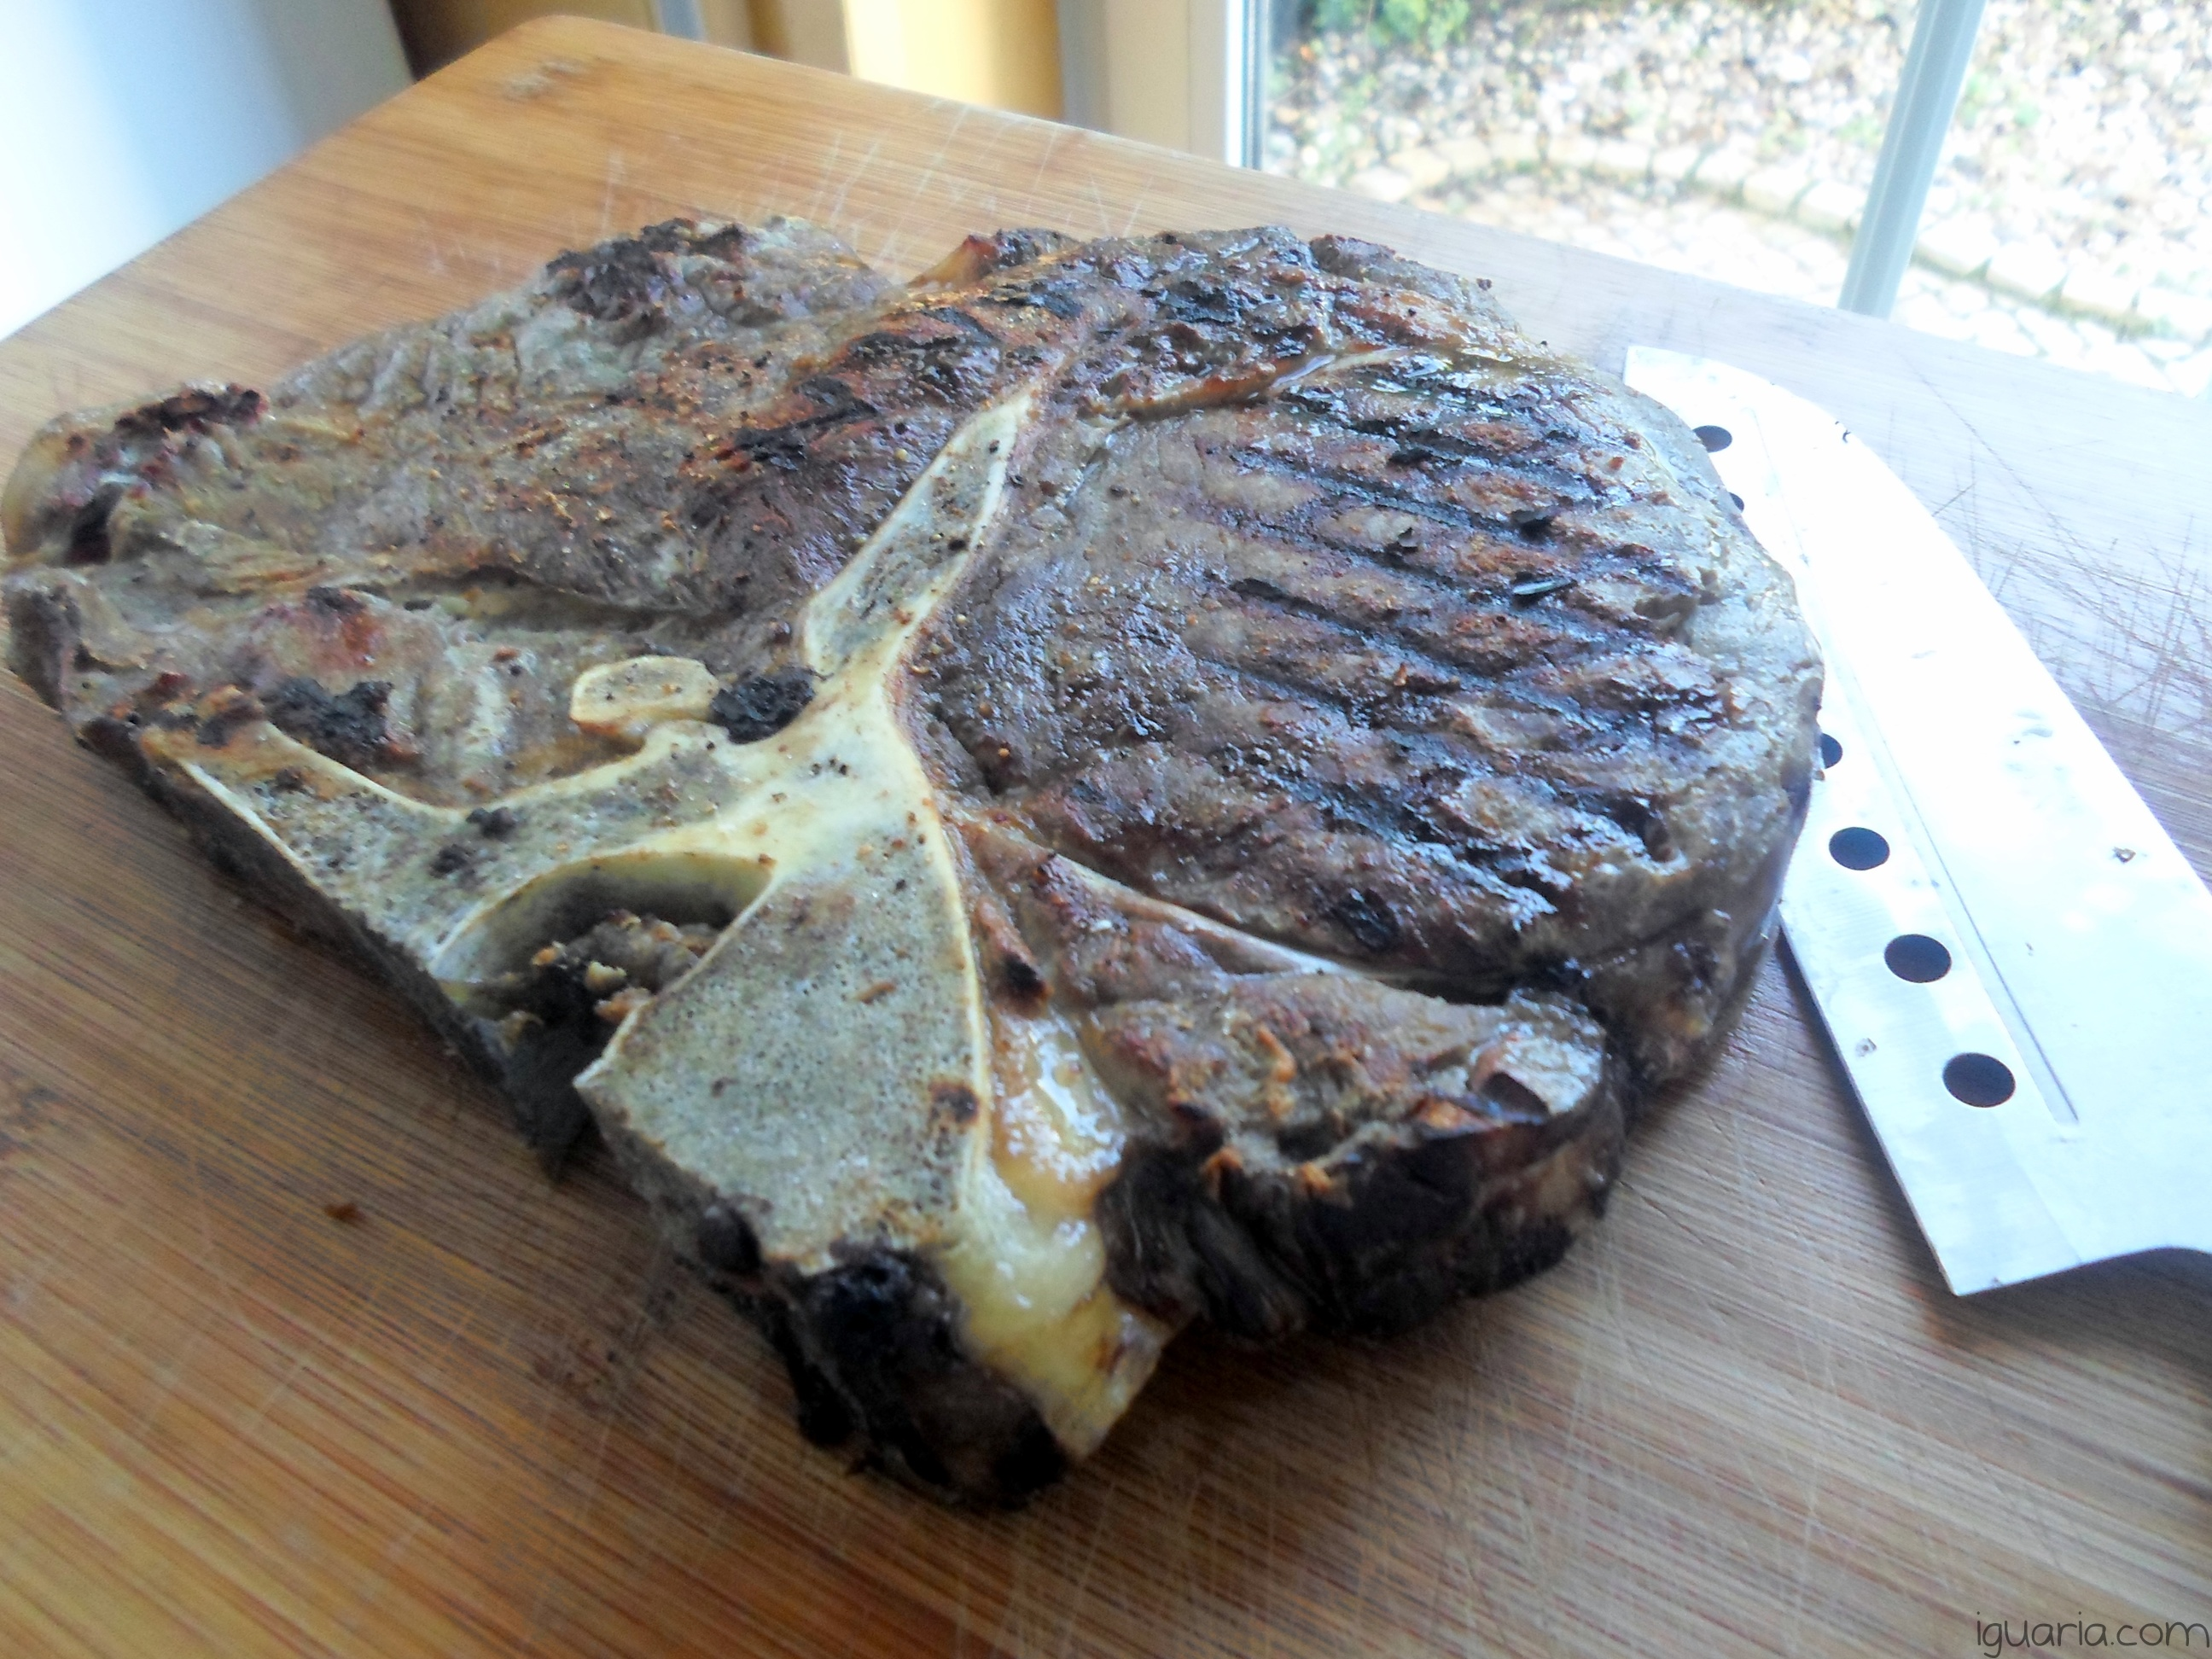 iguaria-como-cozinhar-bife-t-bone